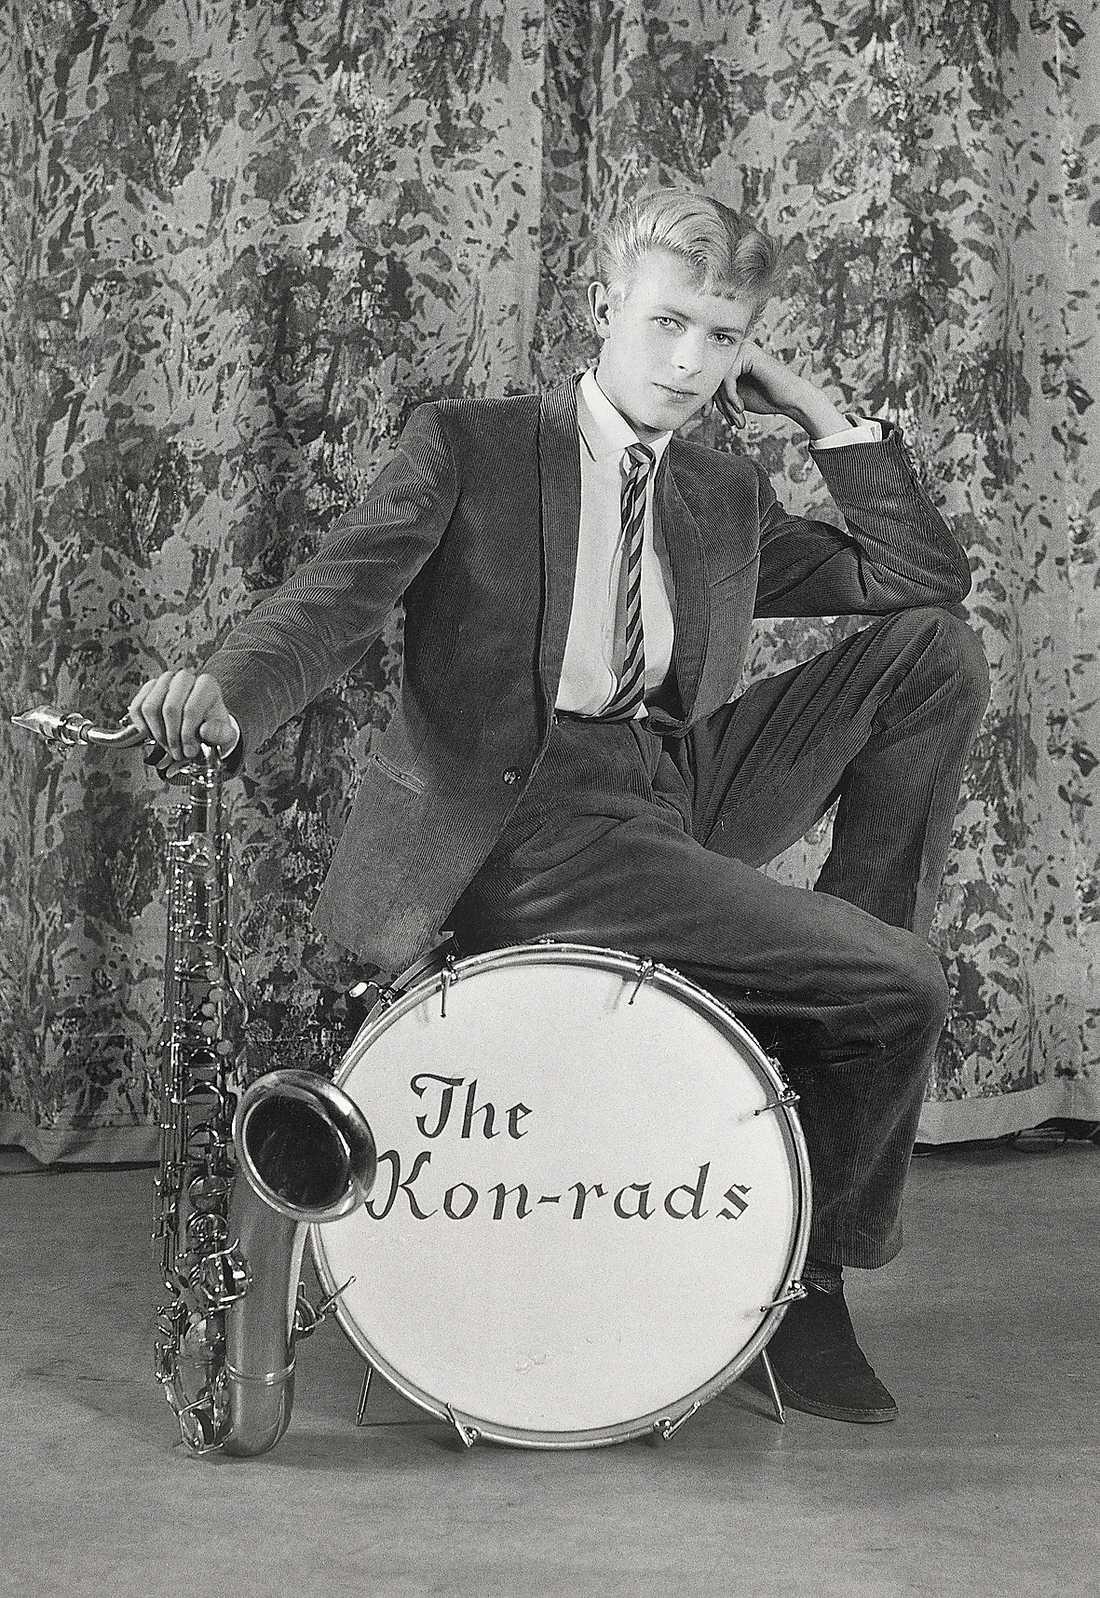 David Bowie (David Jones)  i The Kon-rads 1963.